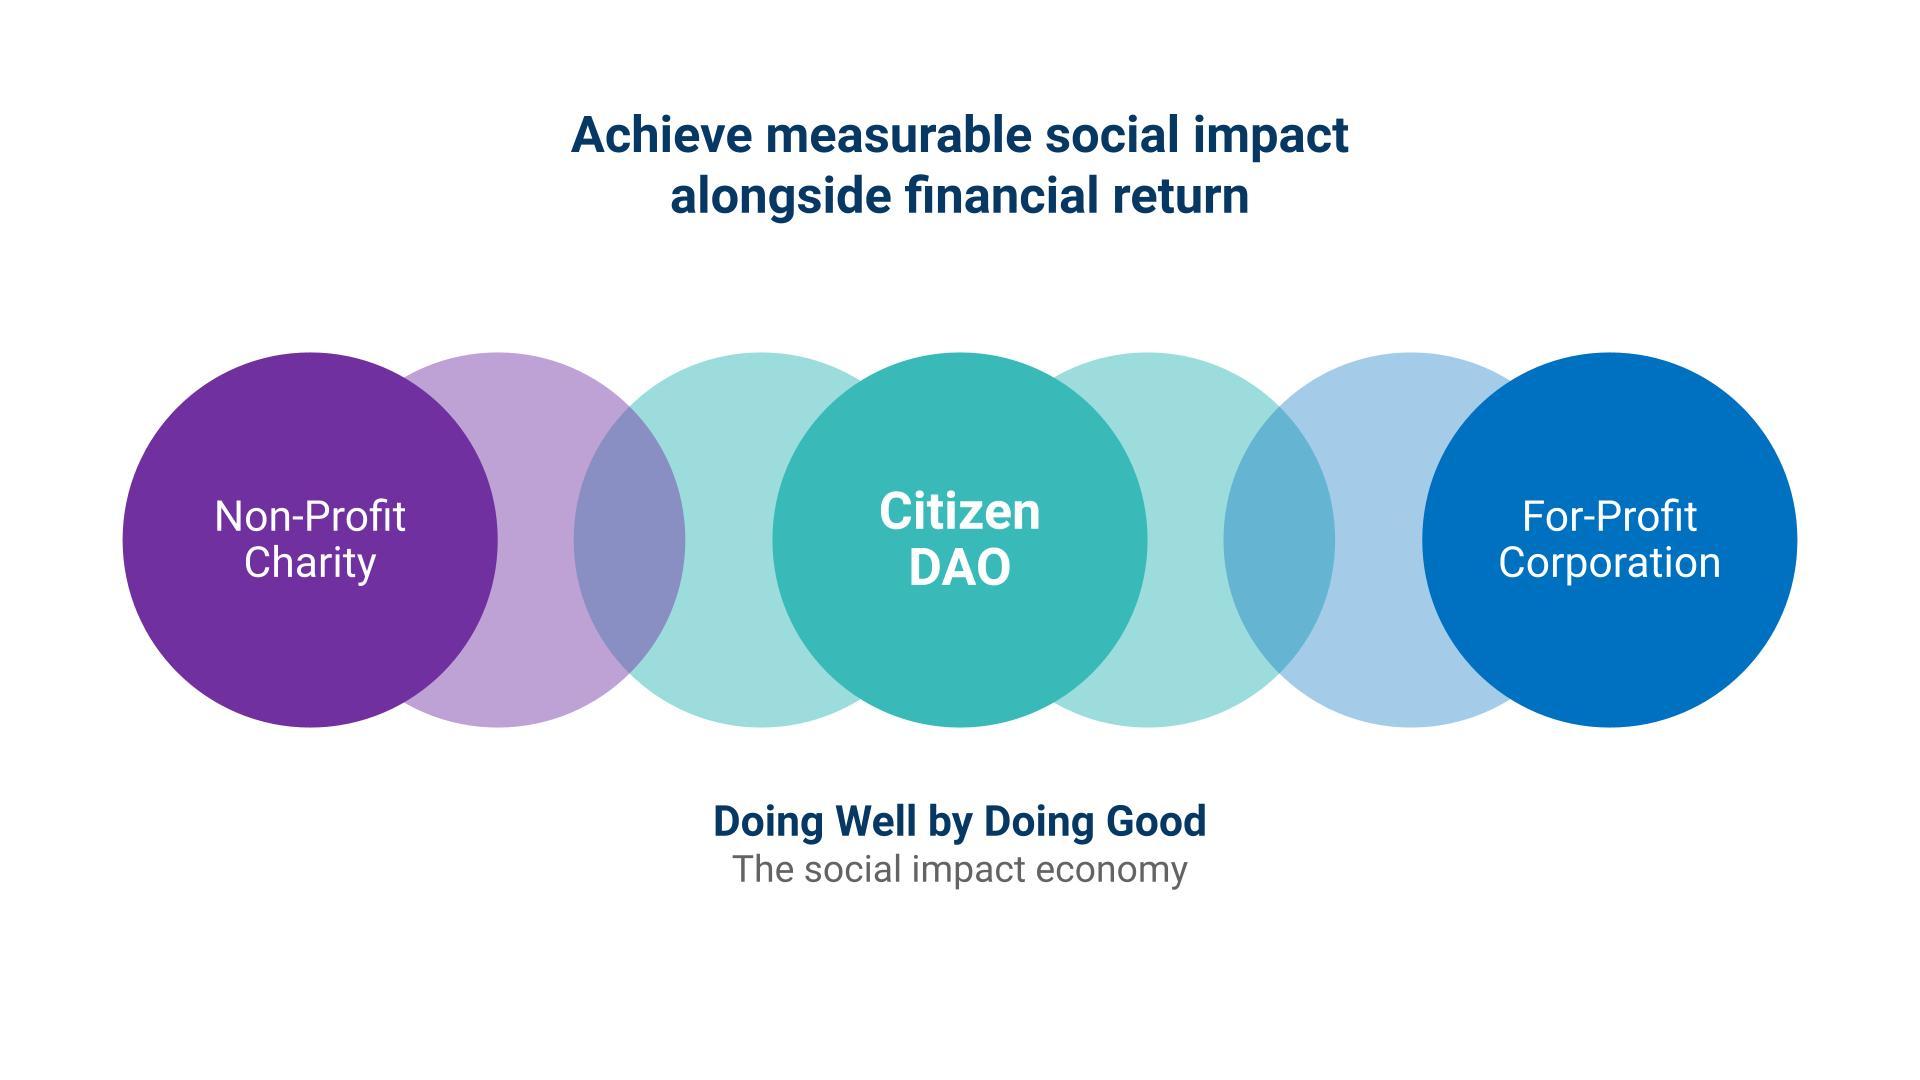 https://ethglobal.s3.amazonaws.com/rec8y7zUS8H97bpVH/Social_Impact_Economy.jpg